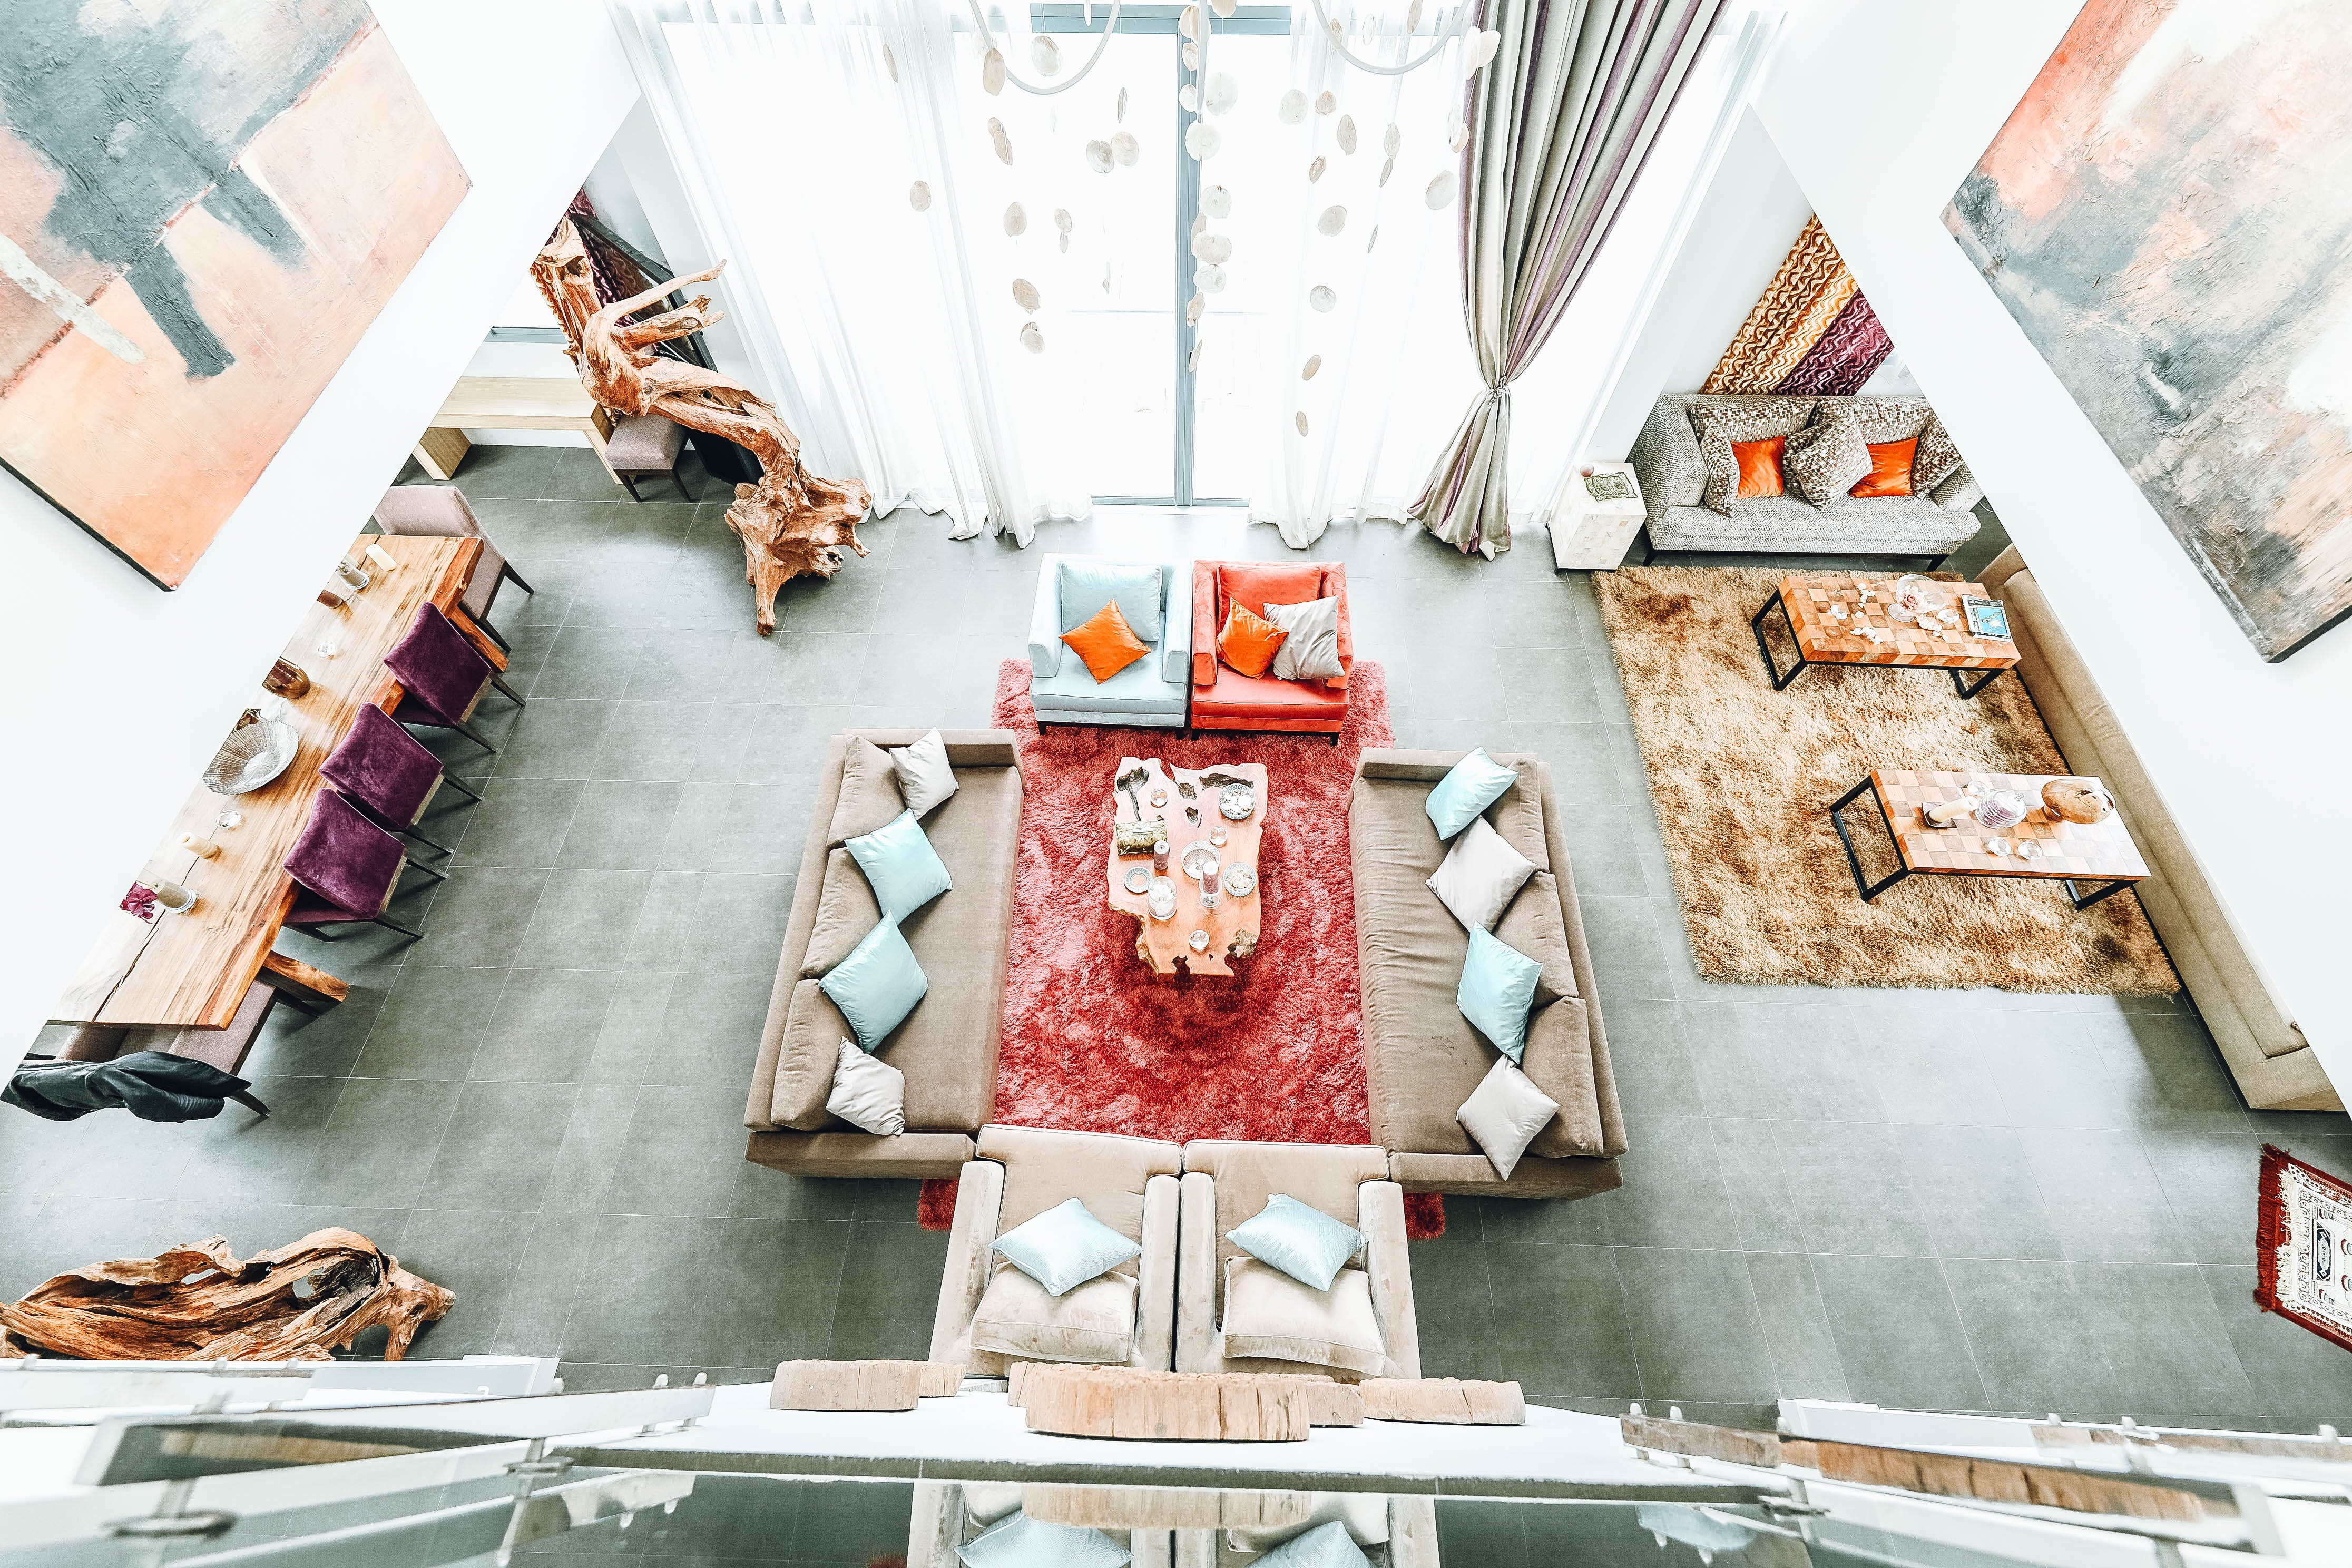 Foto stok gratis Apartemen, bagian dalam, bangku, bantalan